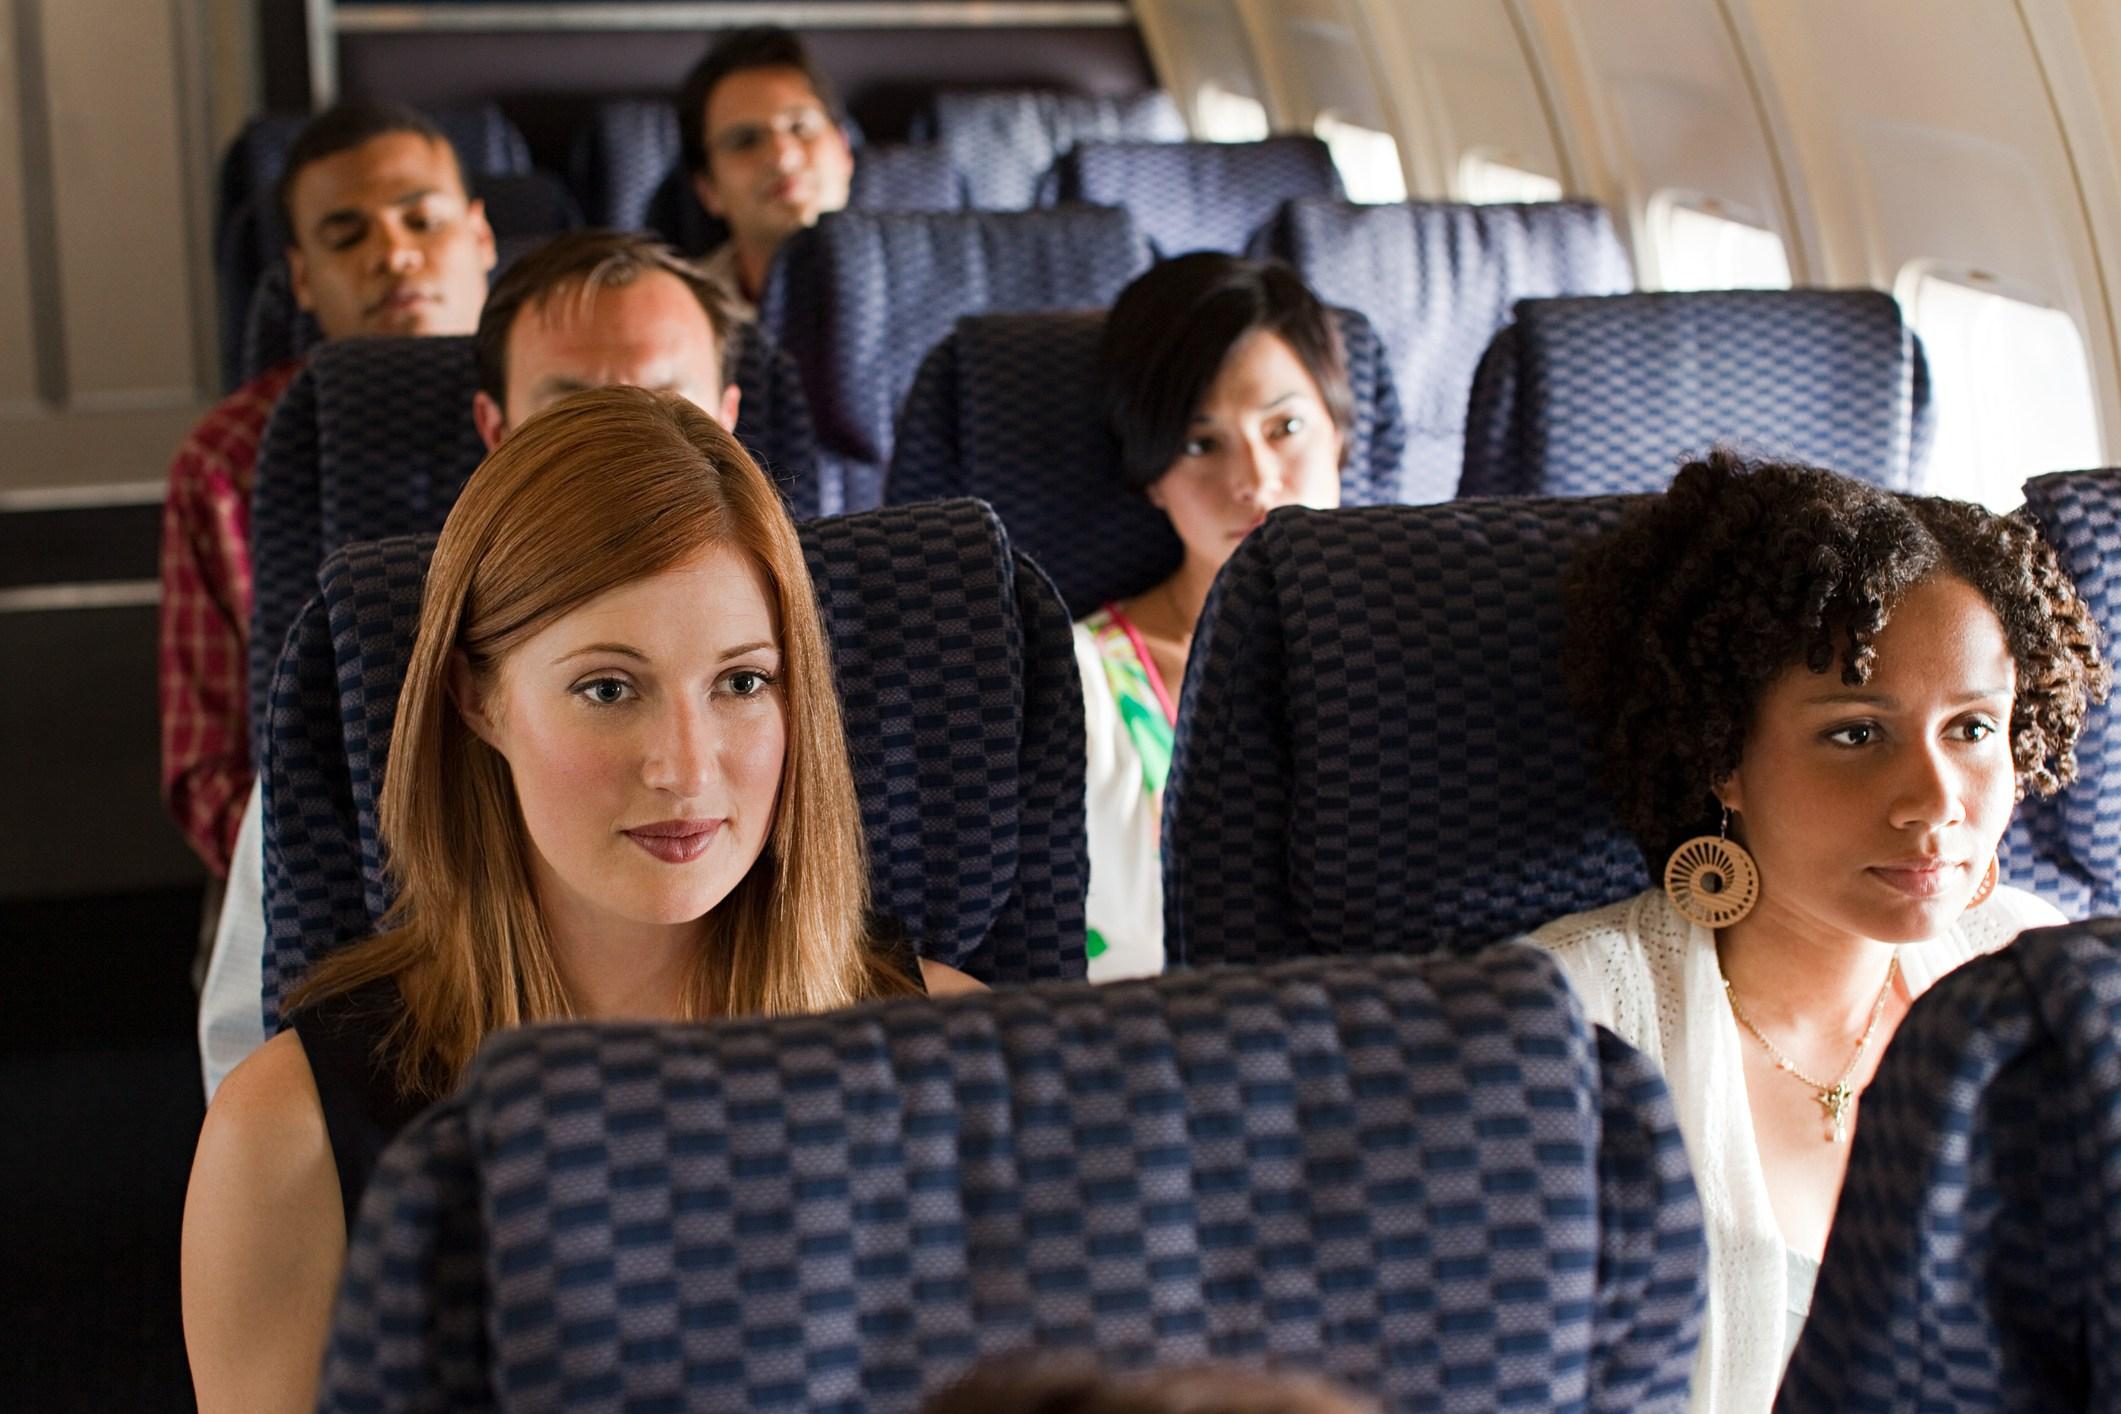 Women sitting on an airplane